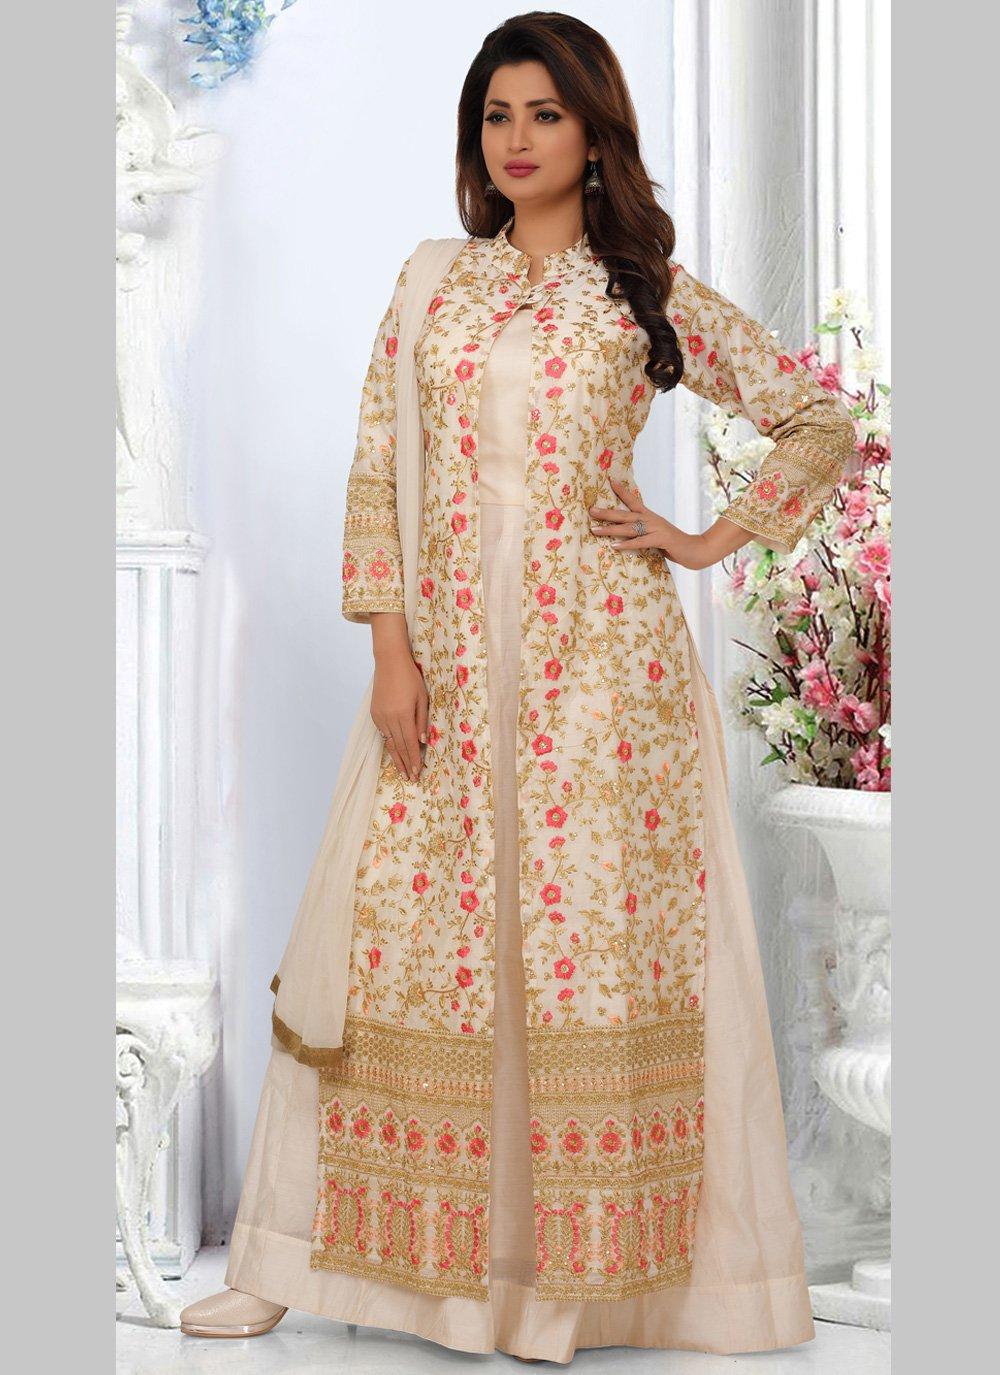 Off White Embroidered Bollywood Salwar Kameez